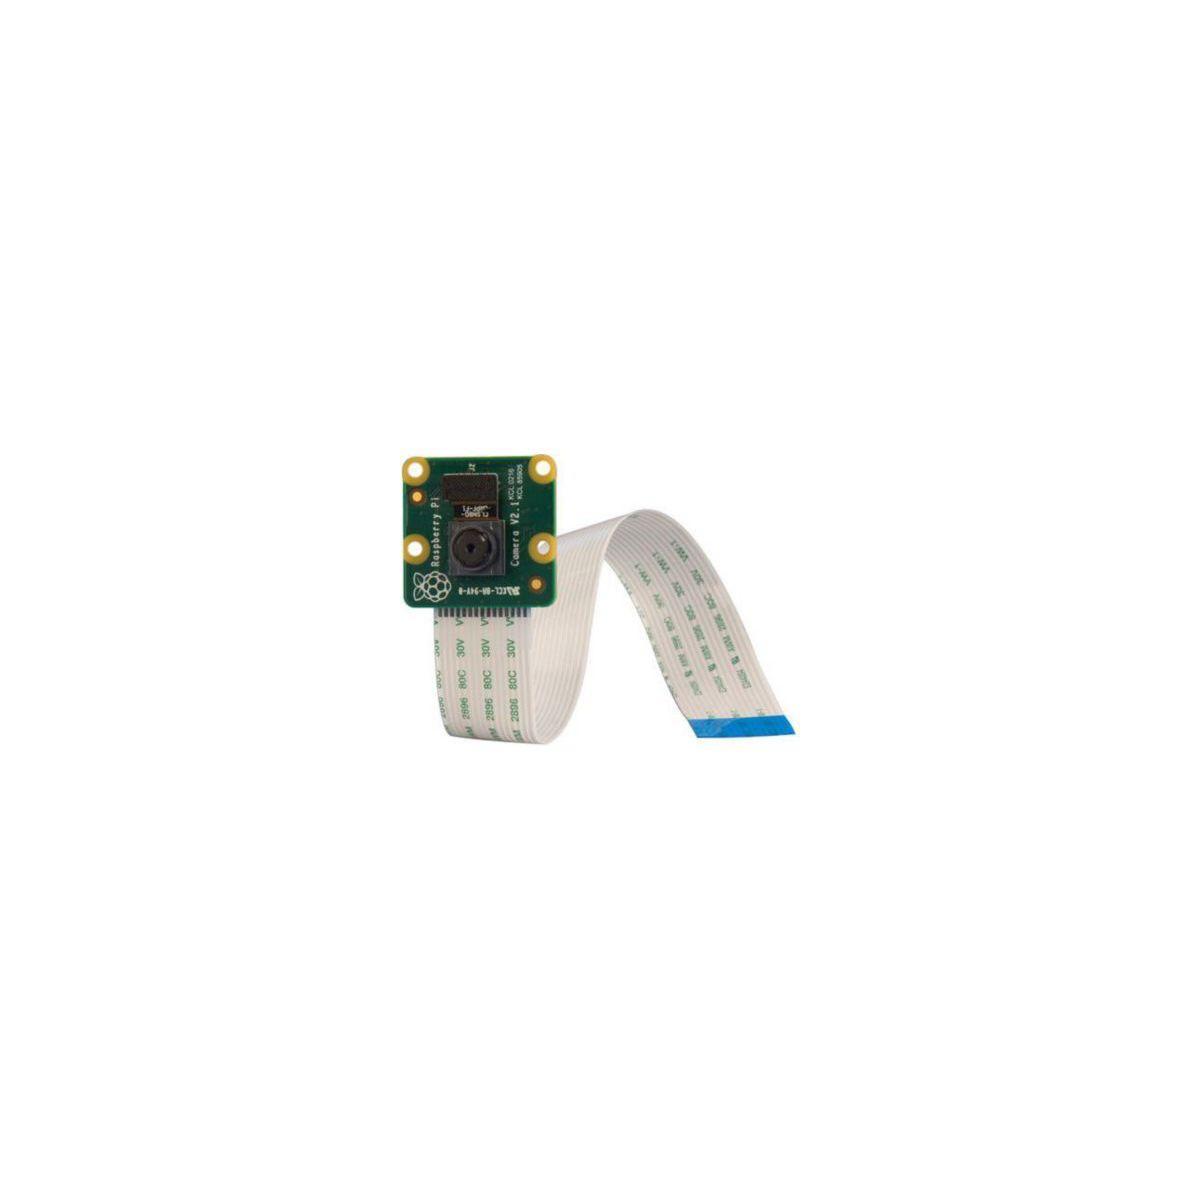 Cam�ra raspberry pi module v2 - 20% de remise imm�diate avec le code : school20 (photo)